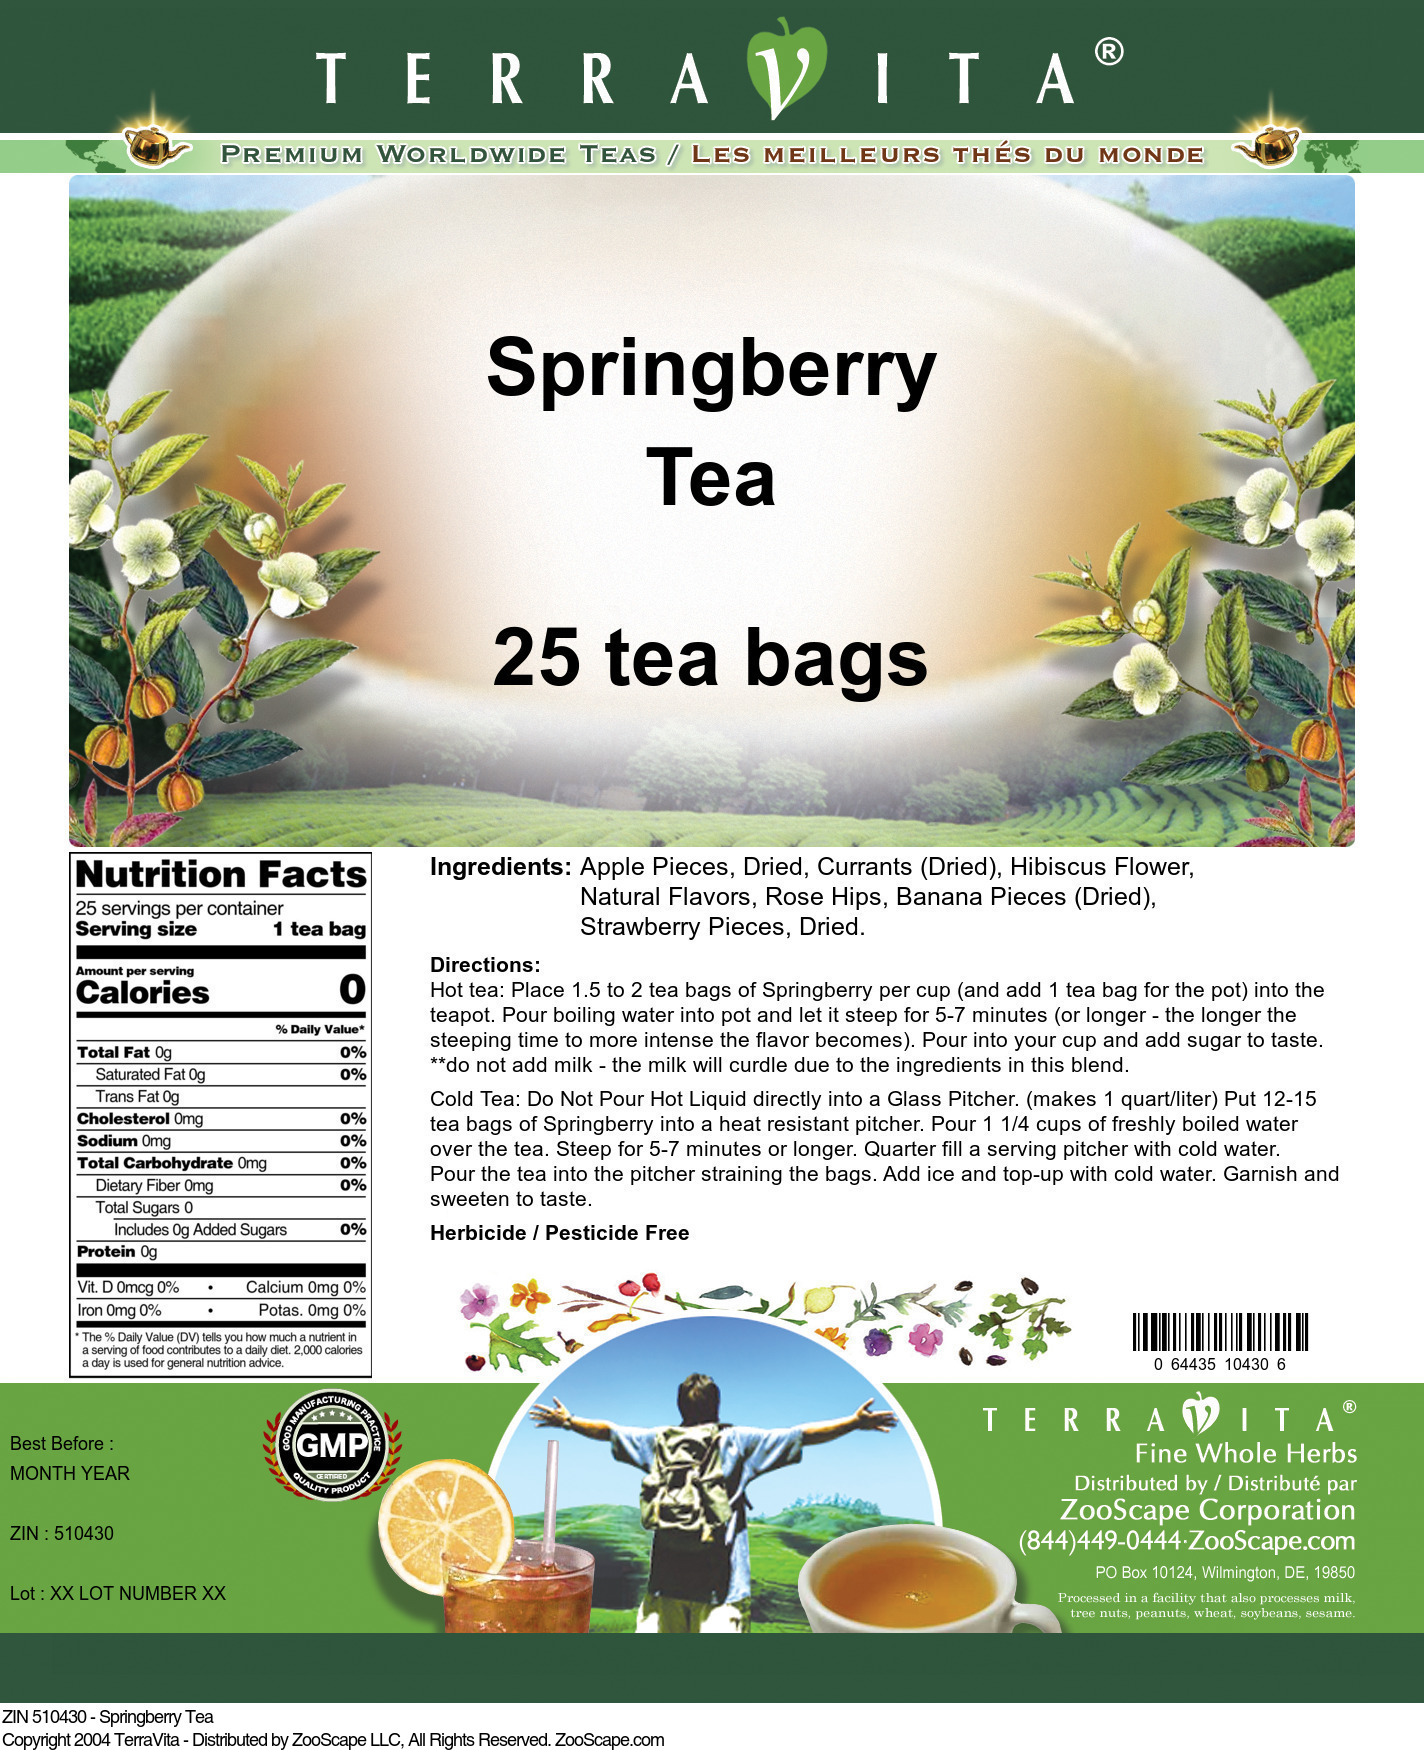 Springberry Tea